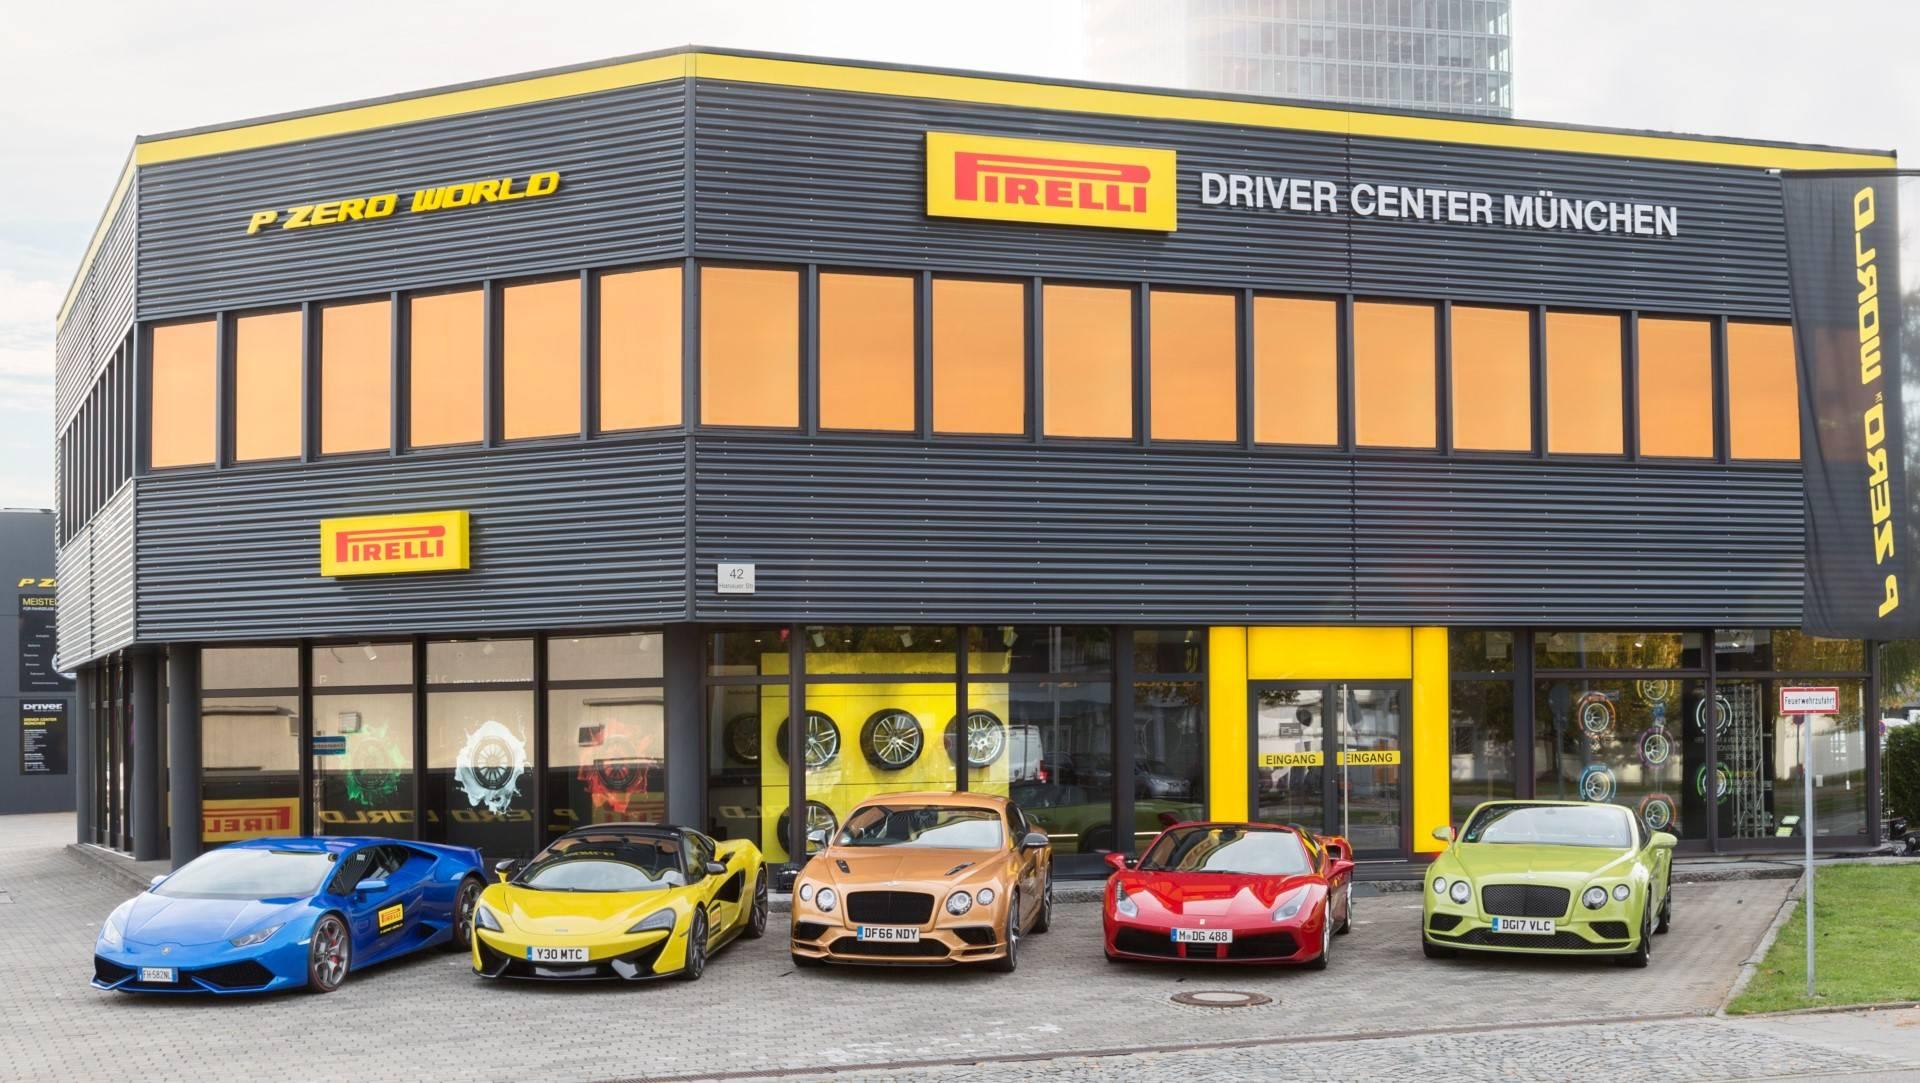 Special Report: Pirelli P Zero World Opens in Munich, Germany